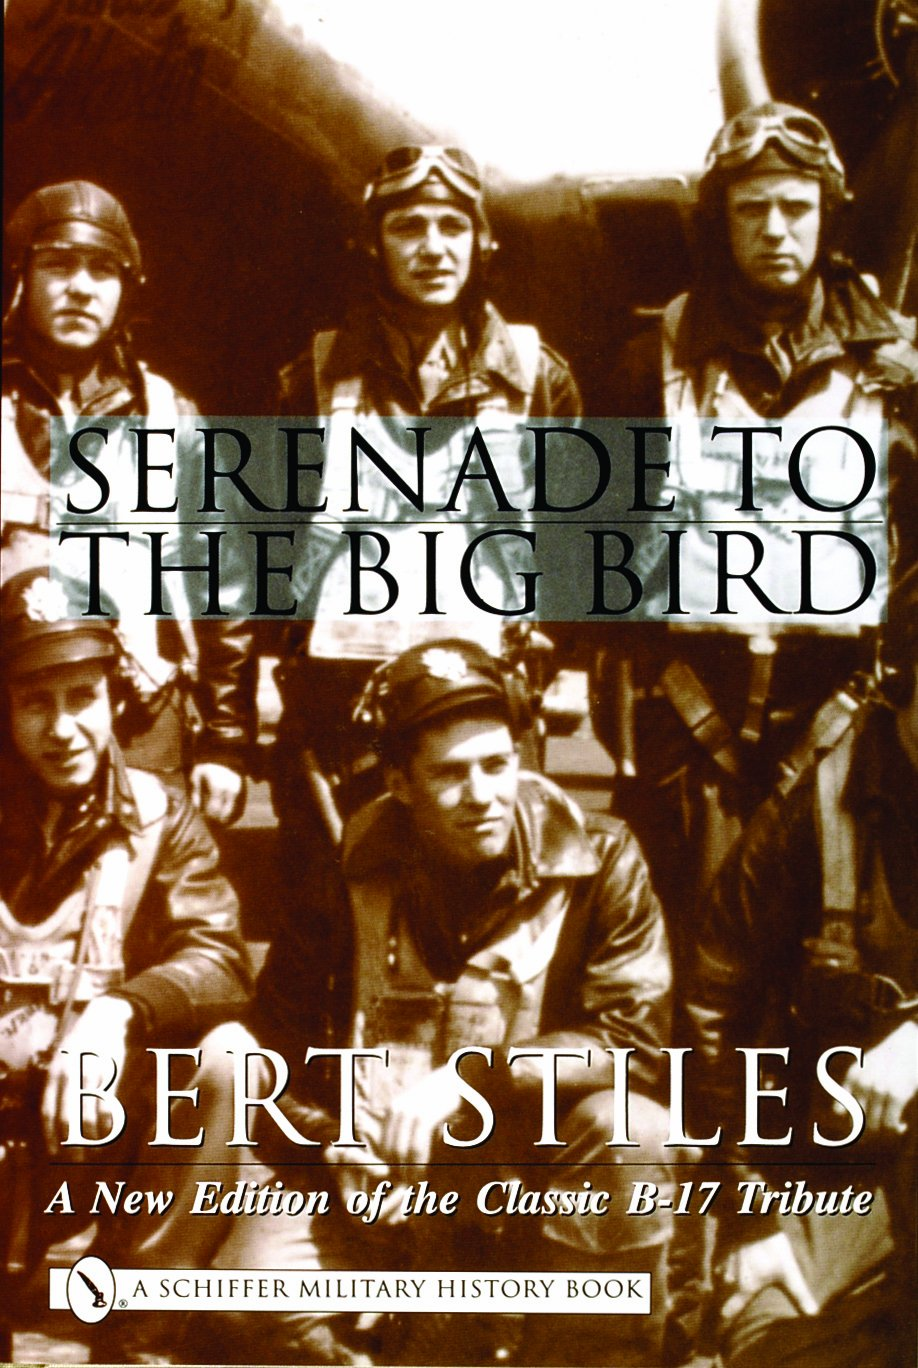 Serenade to the Big Bird (Schiffer Military History) Bert Stiles